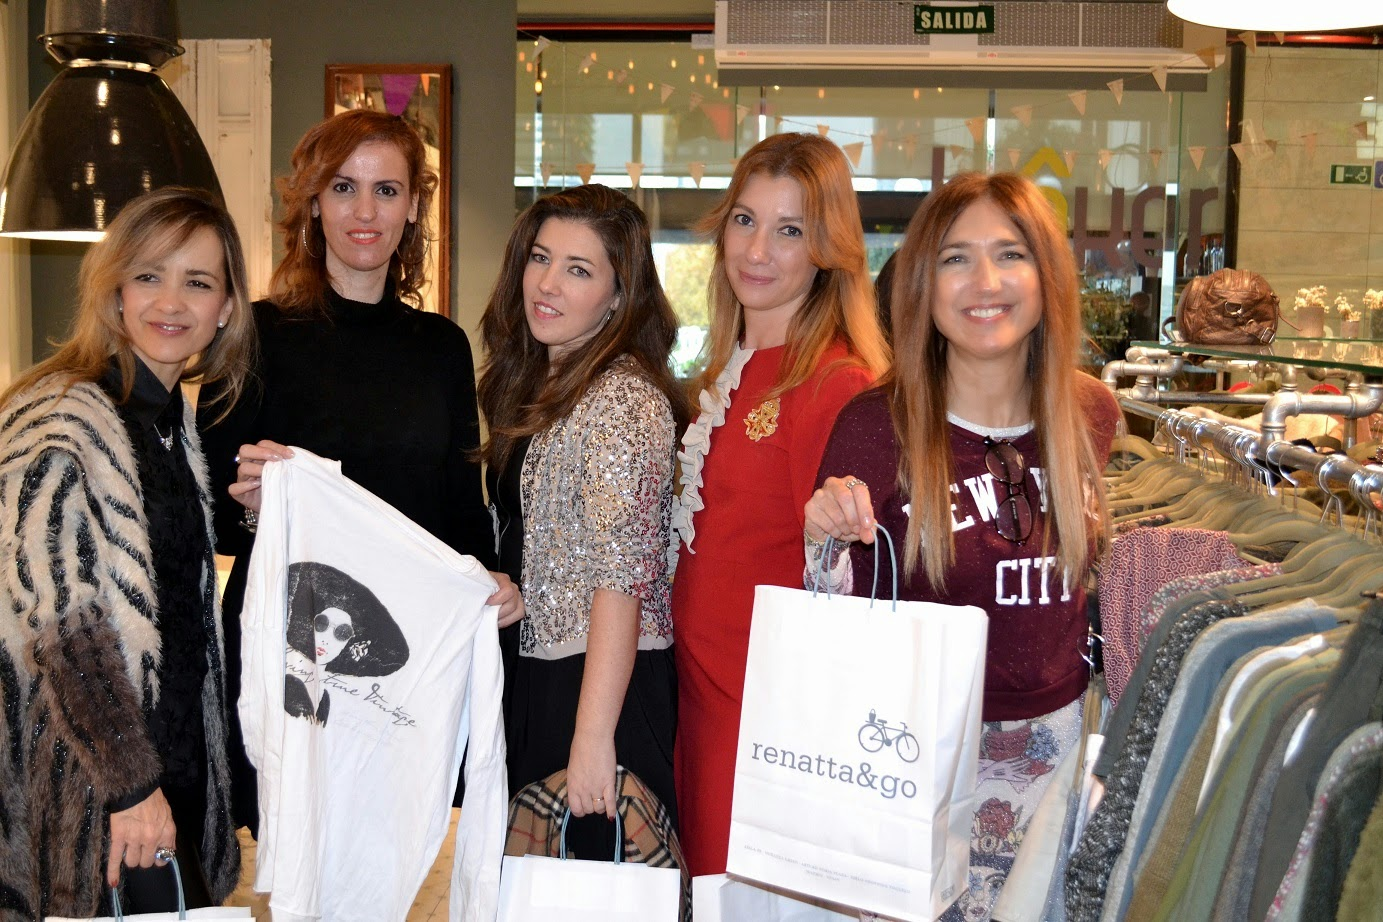 Feria Vintage, CC Moda Shopping, Lorenzo Caprile, Costa Coffe, Renatta and Go, Evento Blogger, street style, Moda Vintage, Cool, Tendencia, Fashion, Carmen Hummer